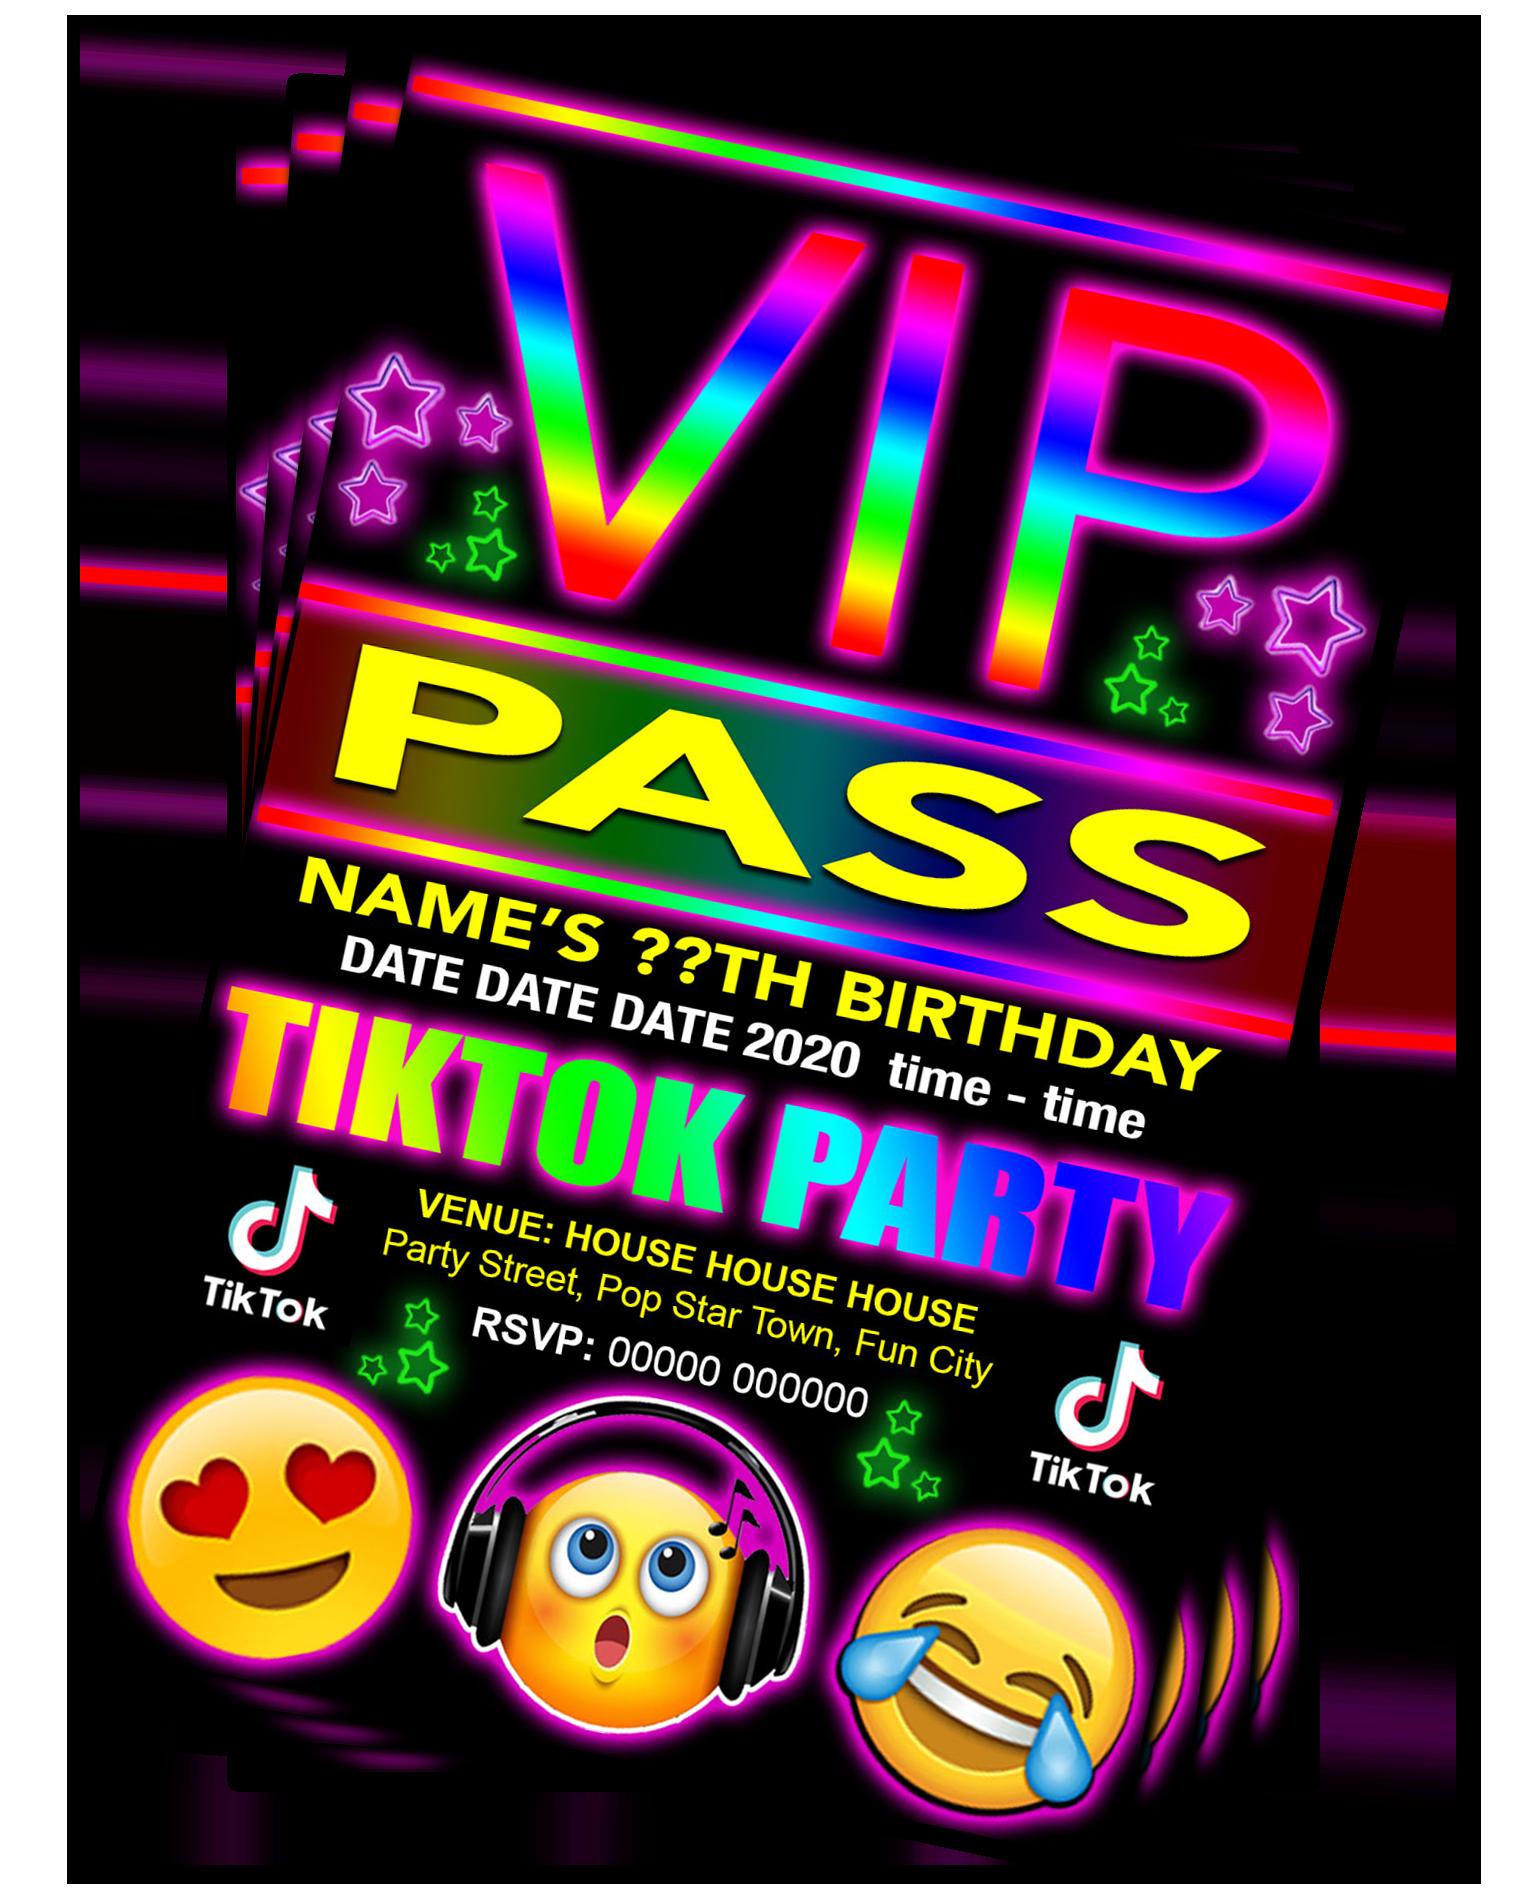 Tiktok Birthday Party Invitation Vip Pass Emoji Red Pink Or Blue Grandwazoodesign